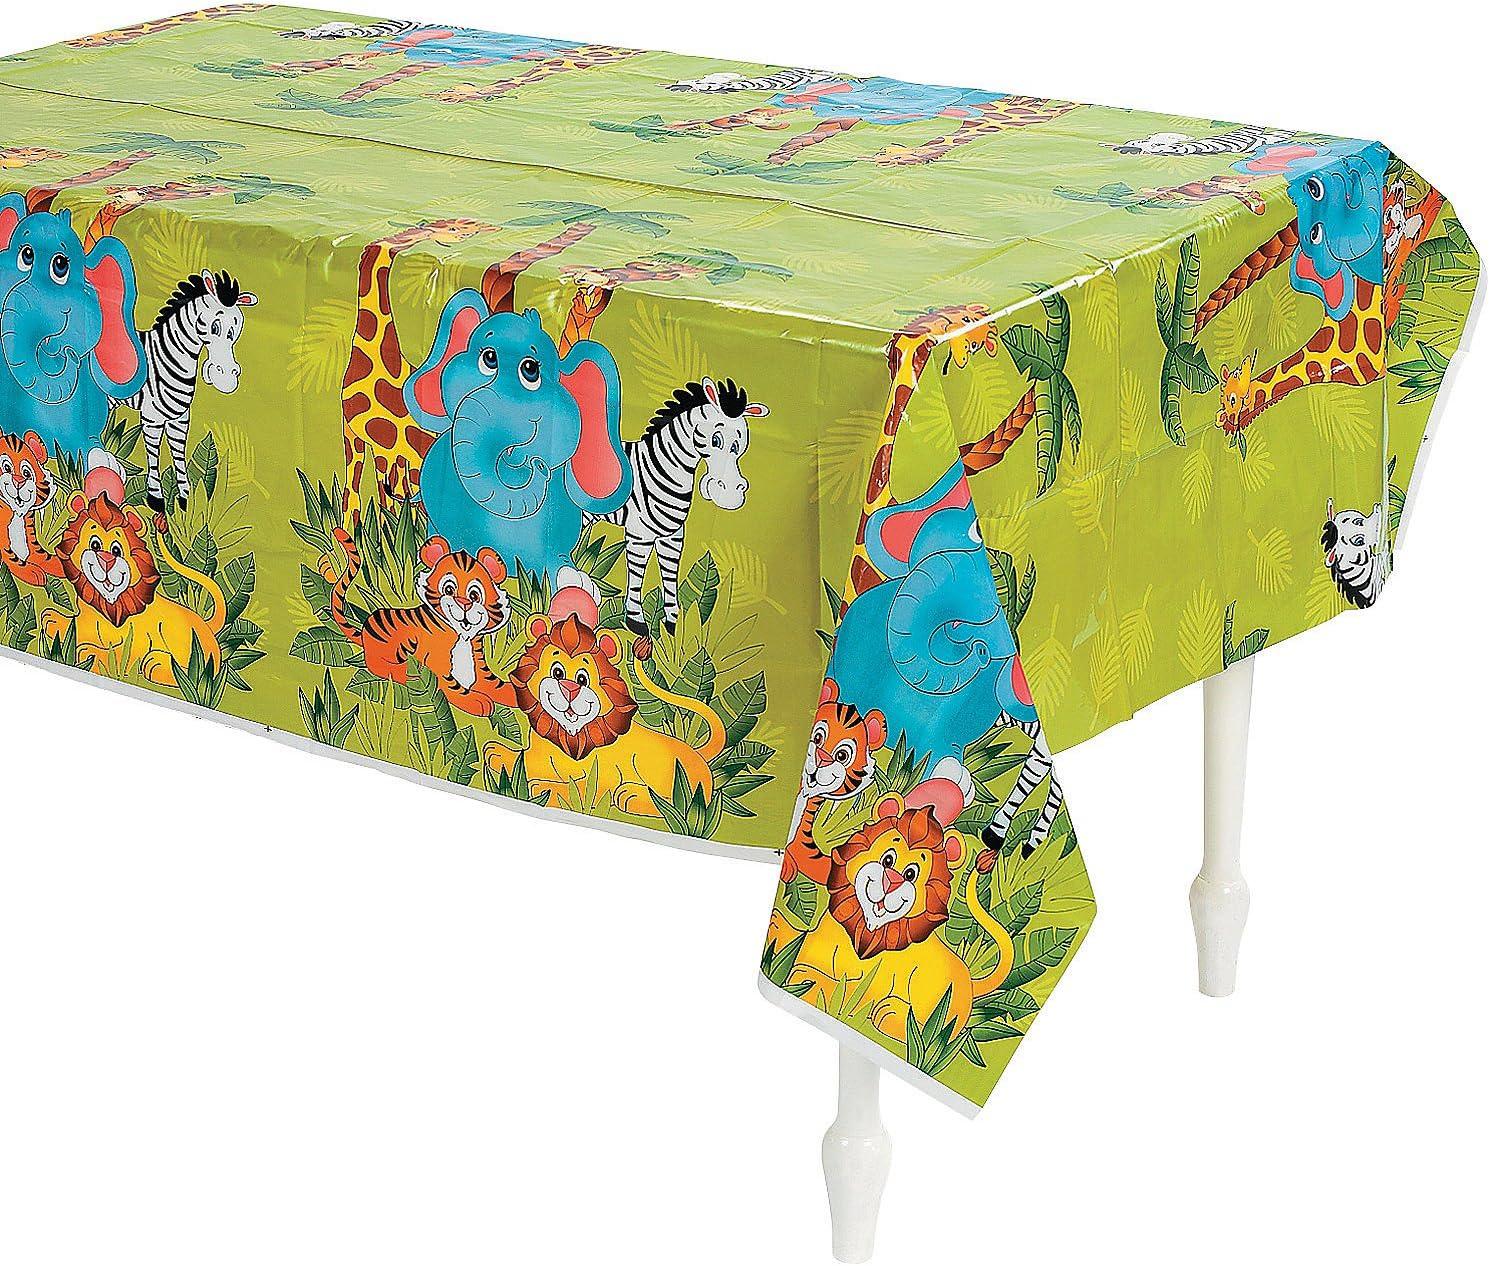 Jungle Safari ZEBRA Animal PRINT Plastic TABLE Cloth COVER Zoo Party Decoration